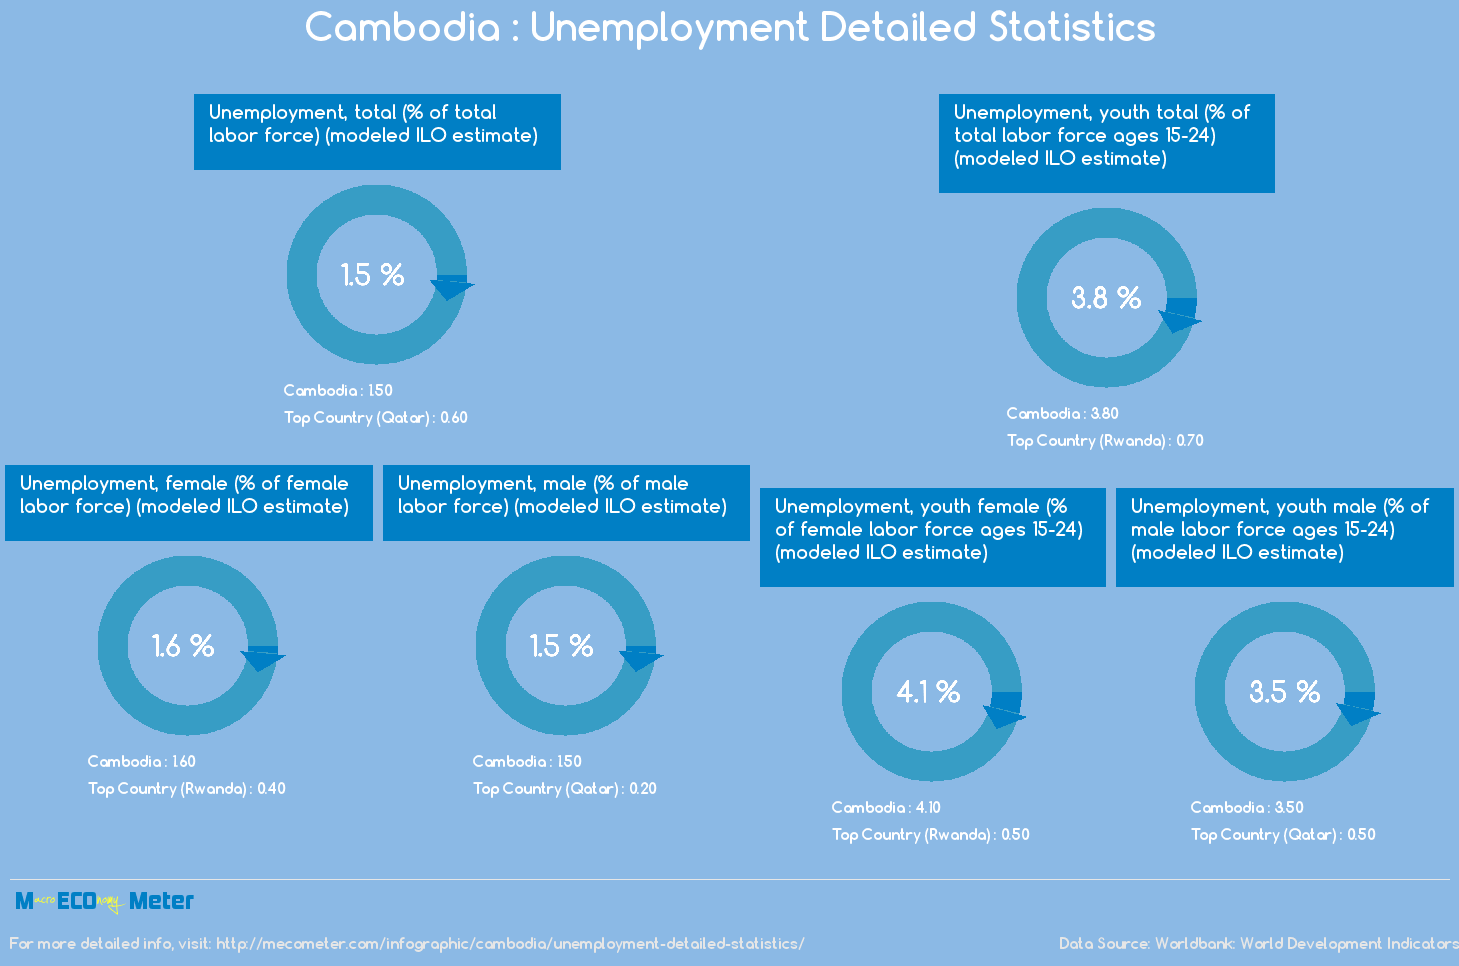 Cambodia : Unemployment Detailed Statistics